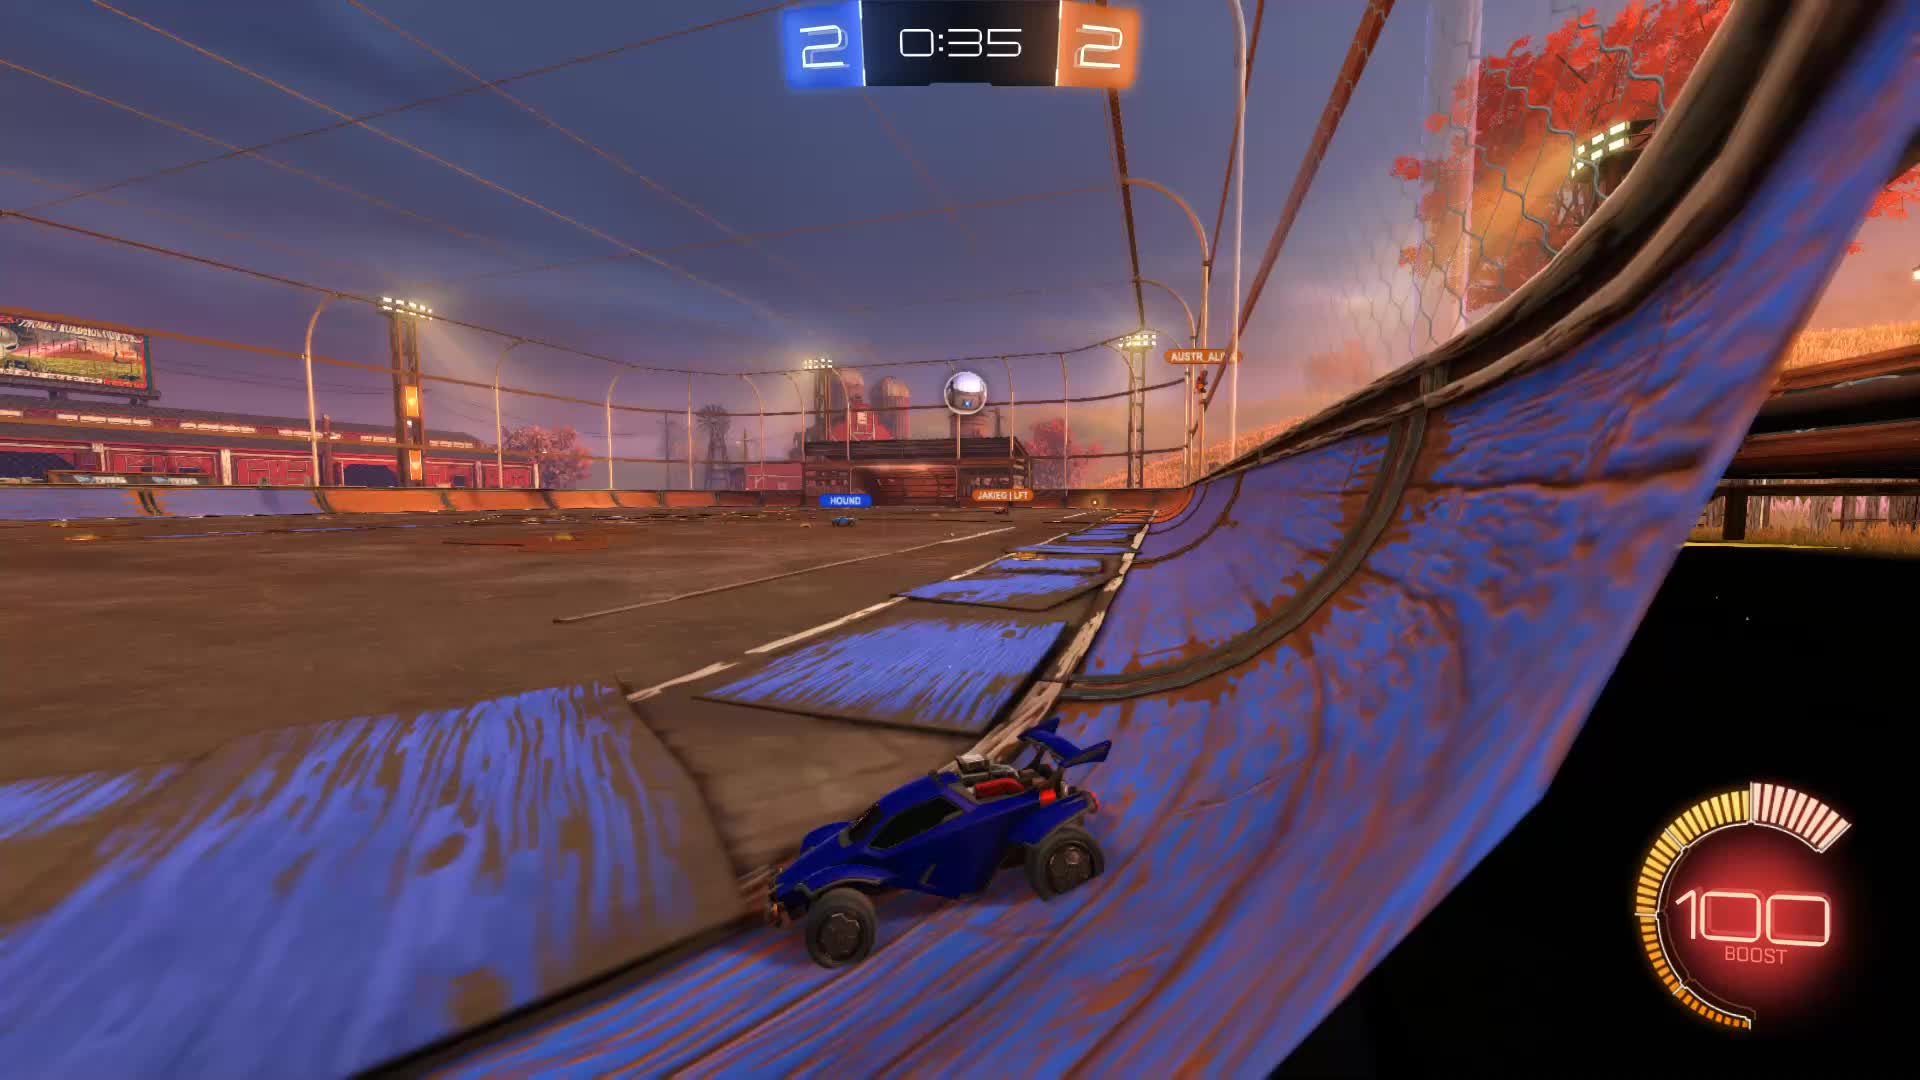 RLFX, Rocket League, RocketLeague, berserk Flip Reset GIFs